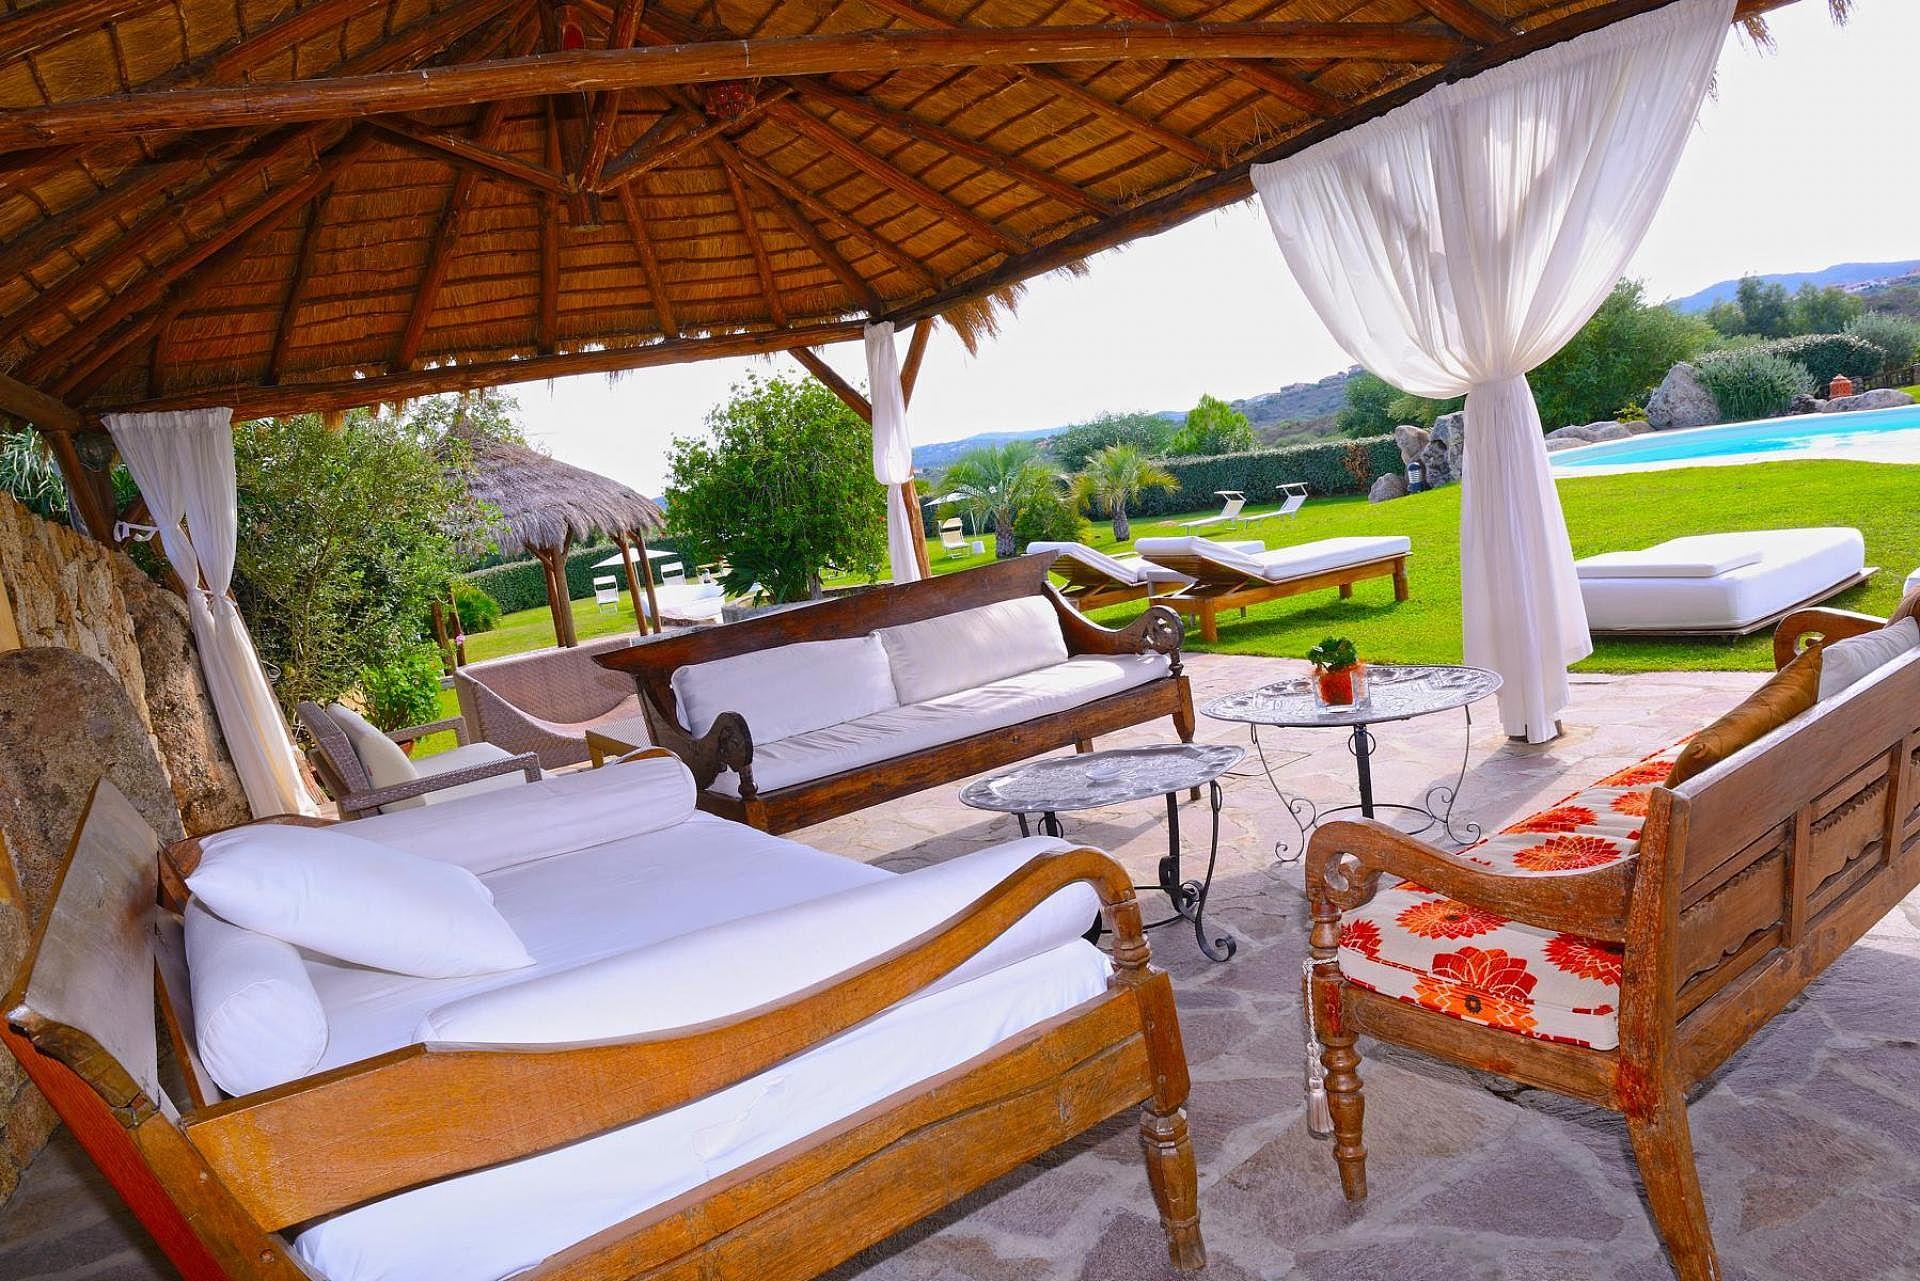 http://extranet.jetlinetravel.info/express-images/express_hotel_ollastu_residence_1.jpg